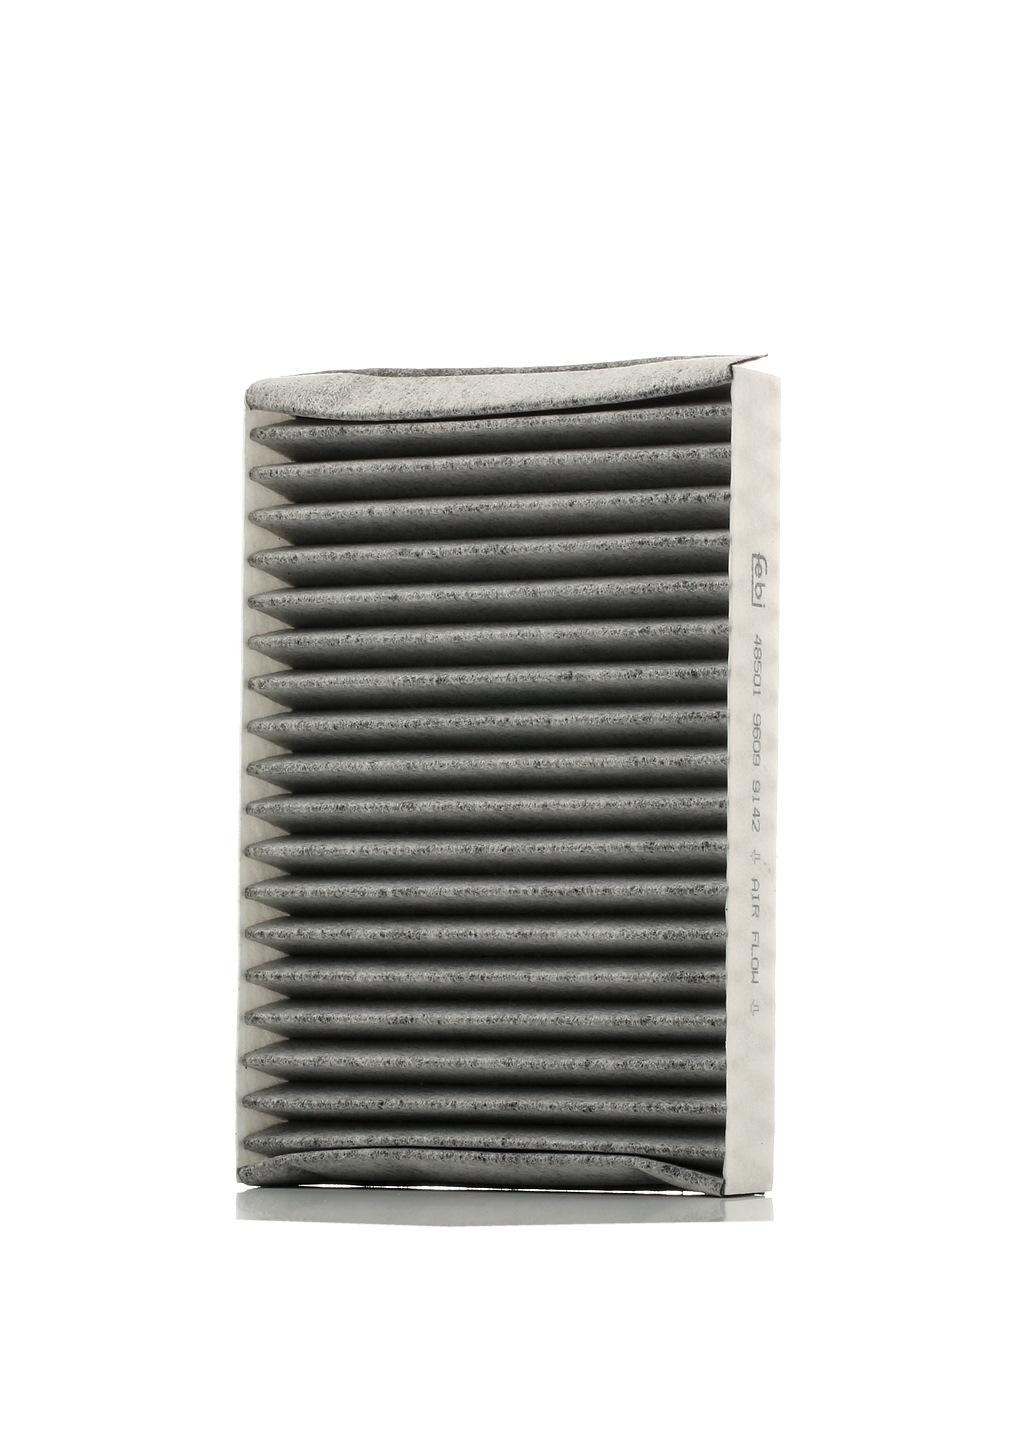 FEBI BILSTEIN 48501 (Largeur: 160,0mm, Hauteur: 30mm, Longueur: 229mm) : Chauffage / ventilation Renault Kangoo kc01 2012